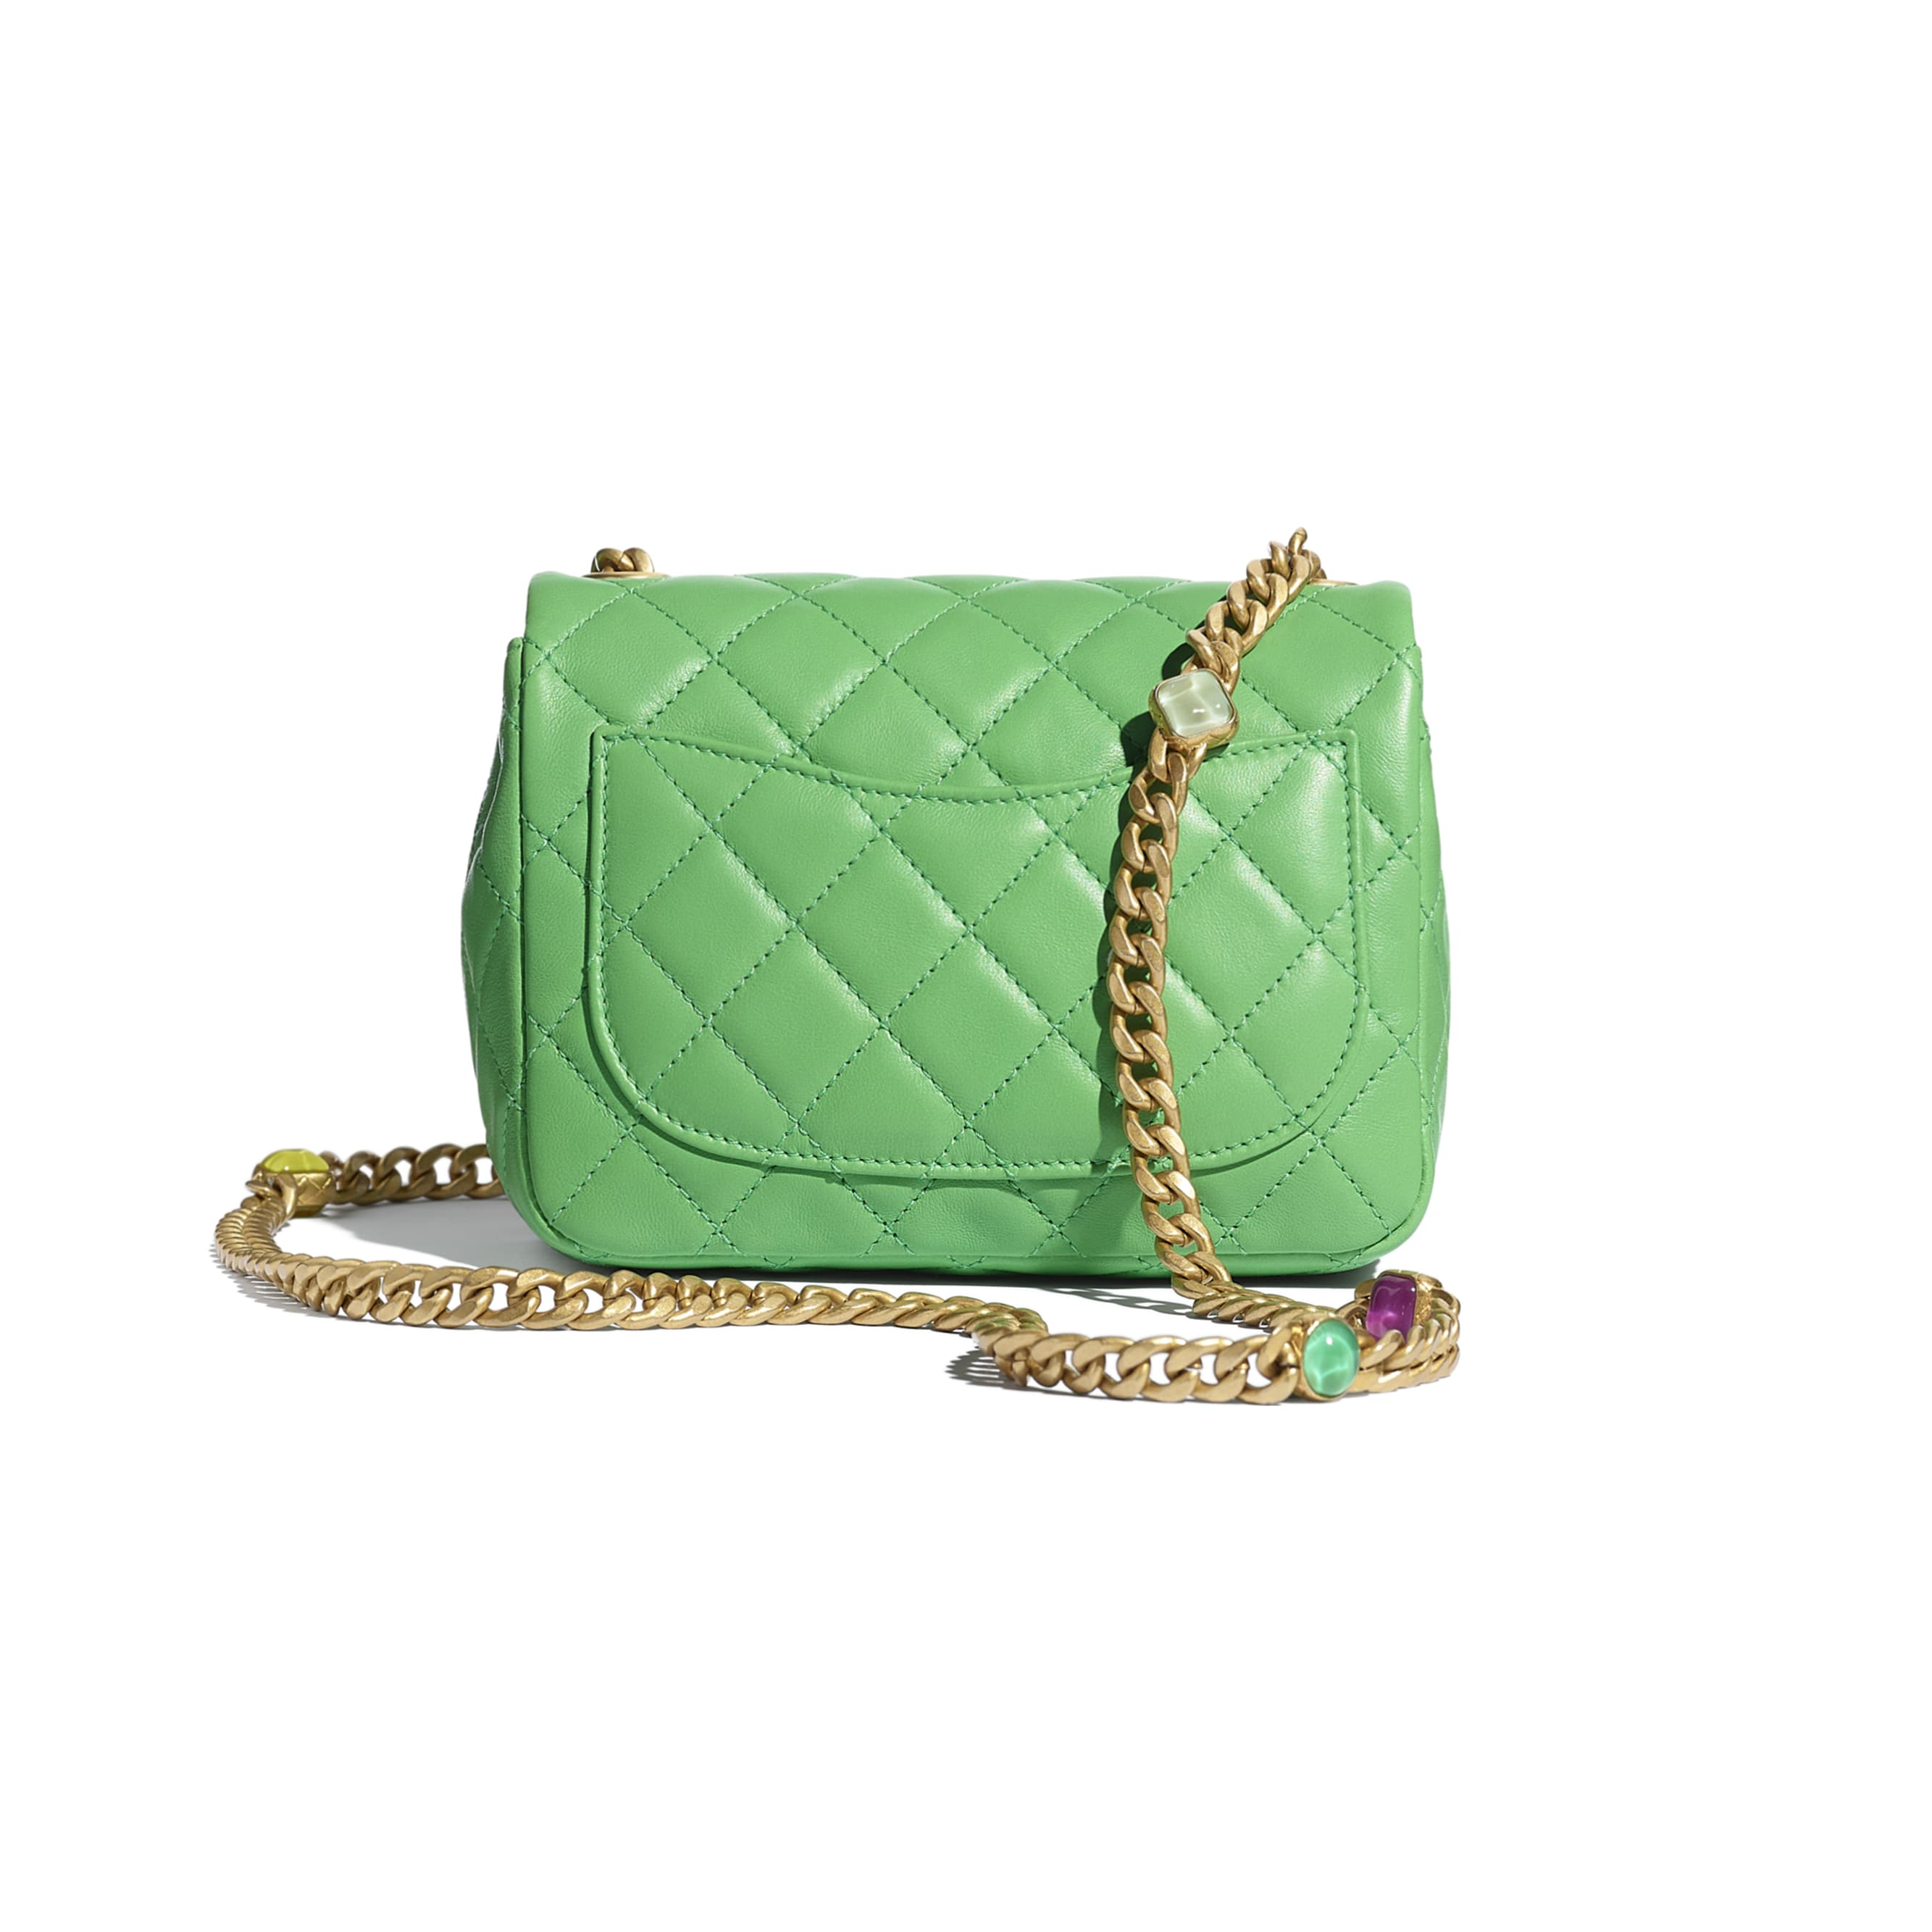 Flap Bag - Green - Lambskin, Resin & Gold-Tone Metal - CHANEL - Alternative view - see standard sized version